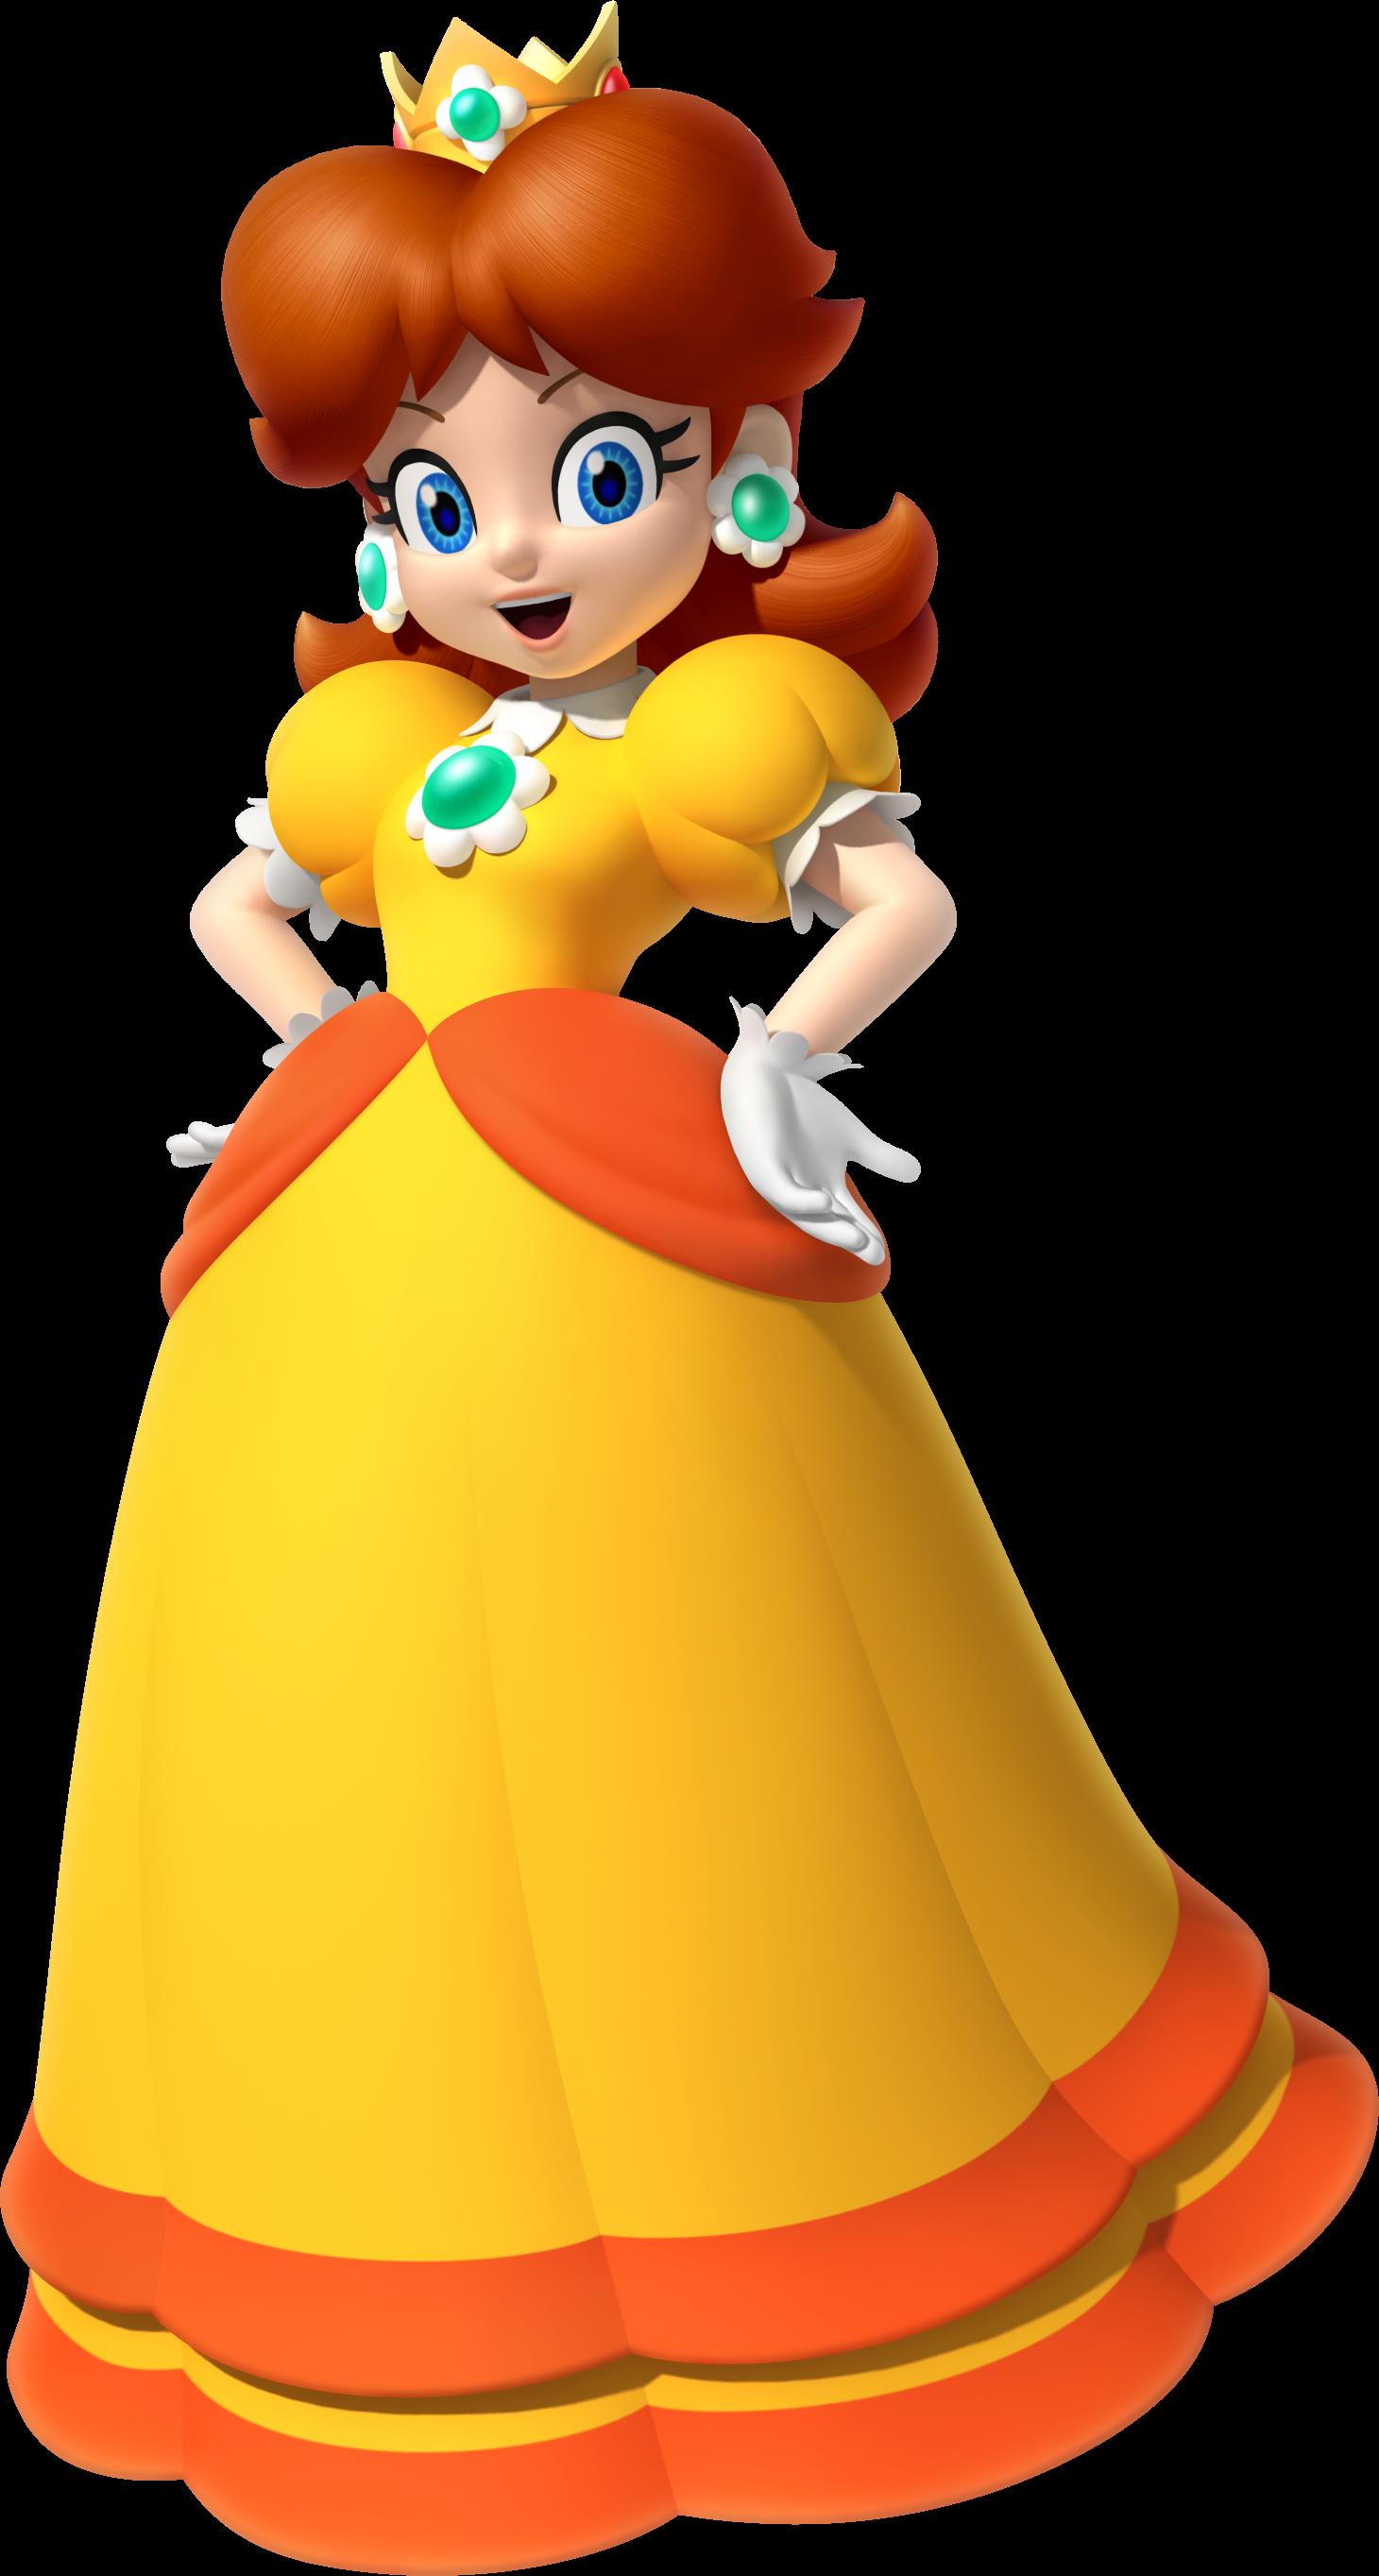 princesse-daisy